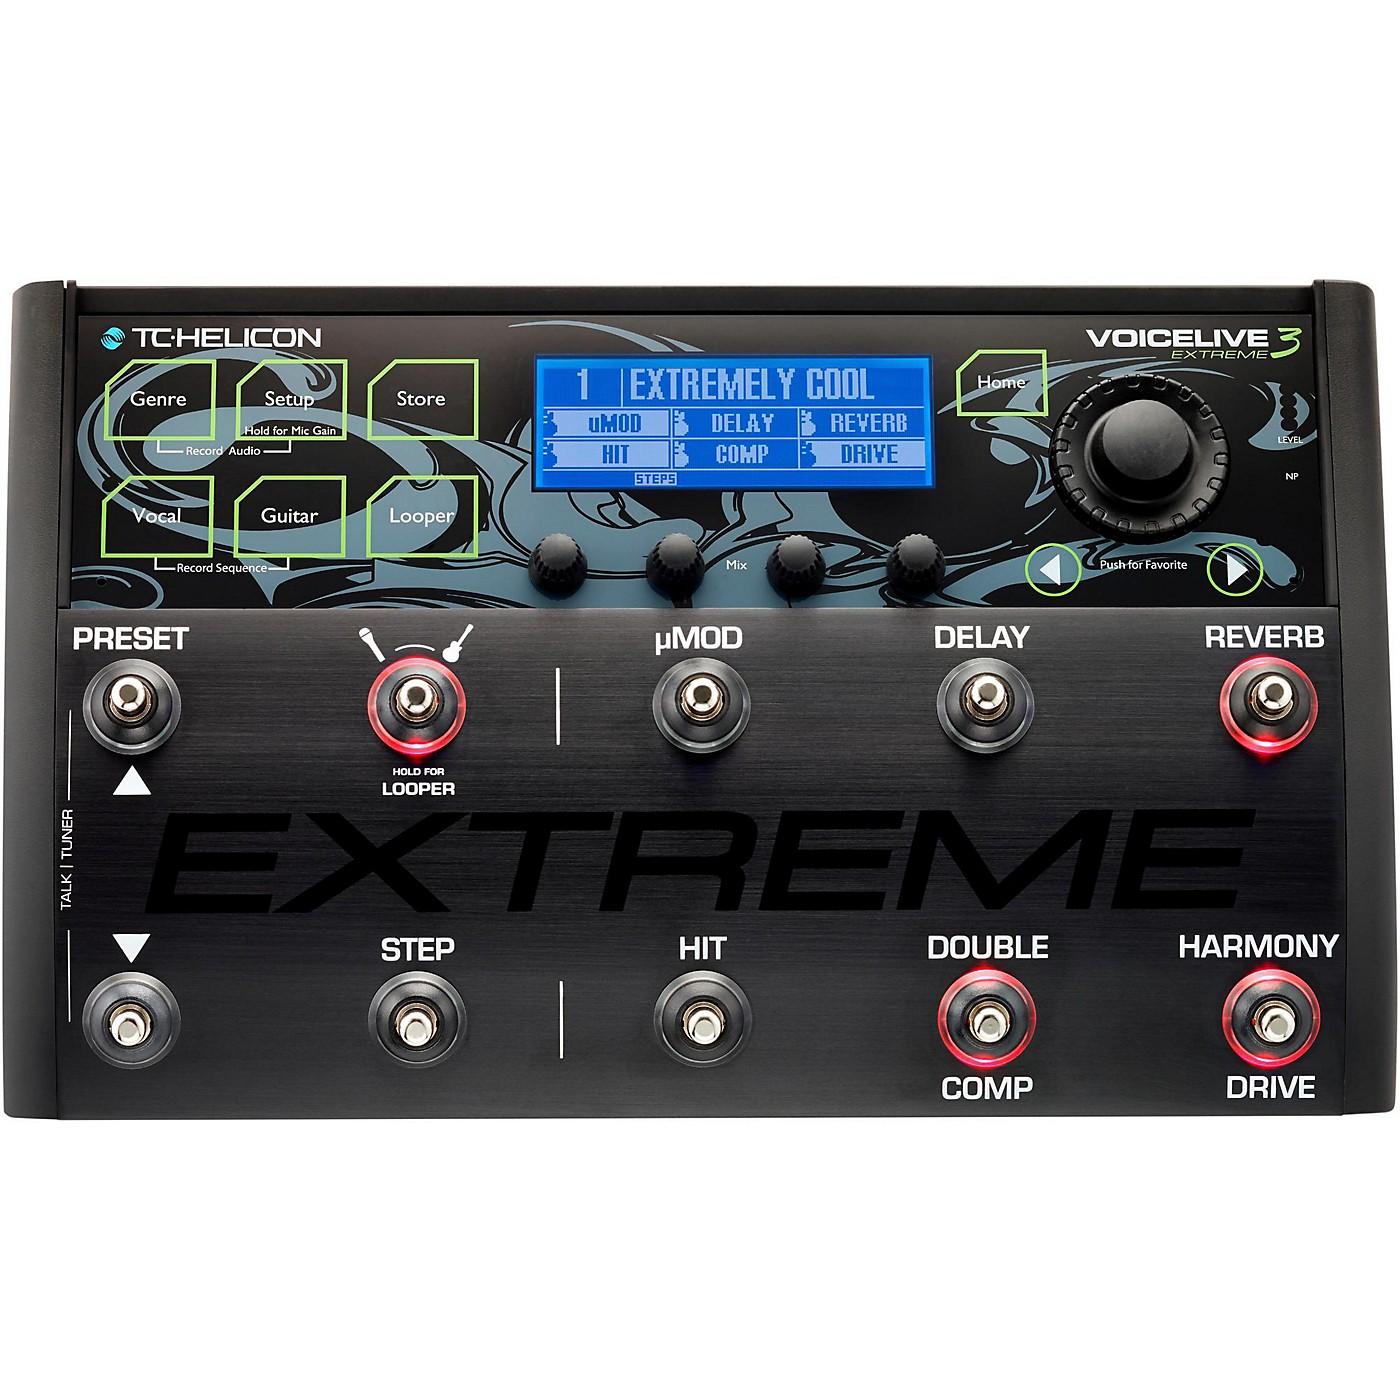 TC Helicon VoiceLive 3 Extreme thumbnail